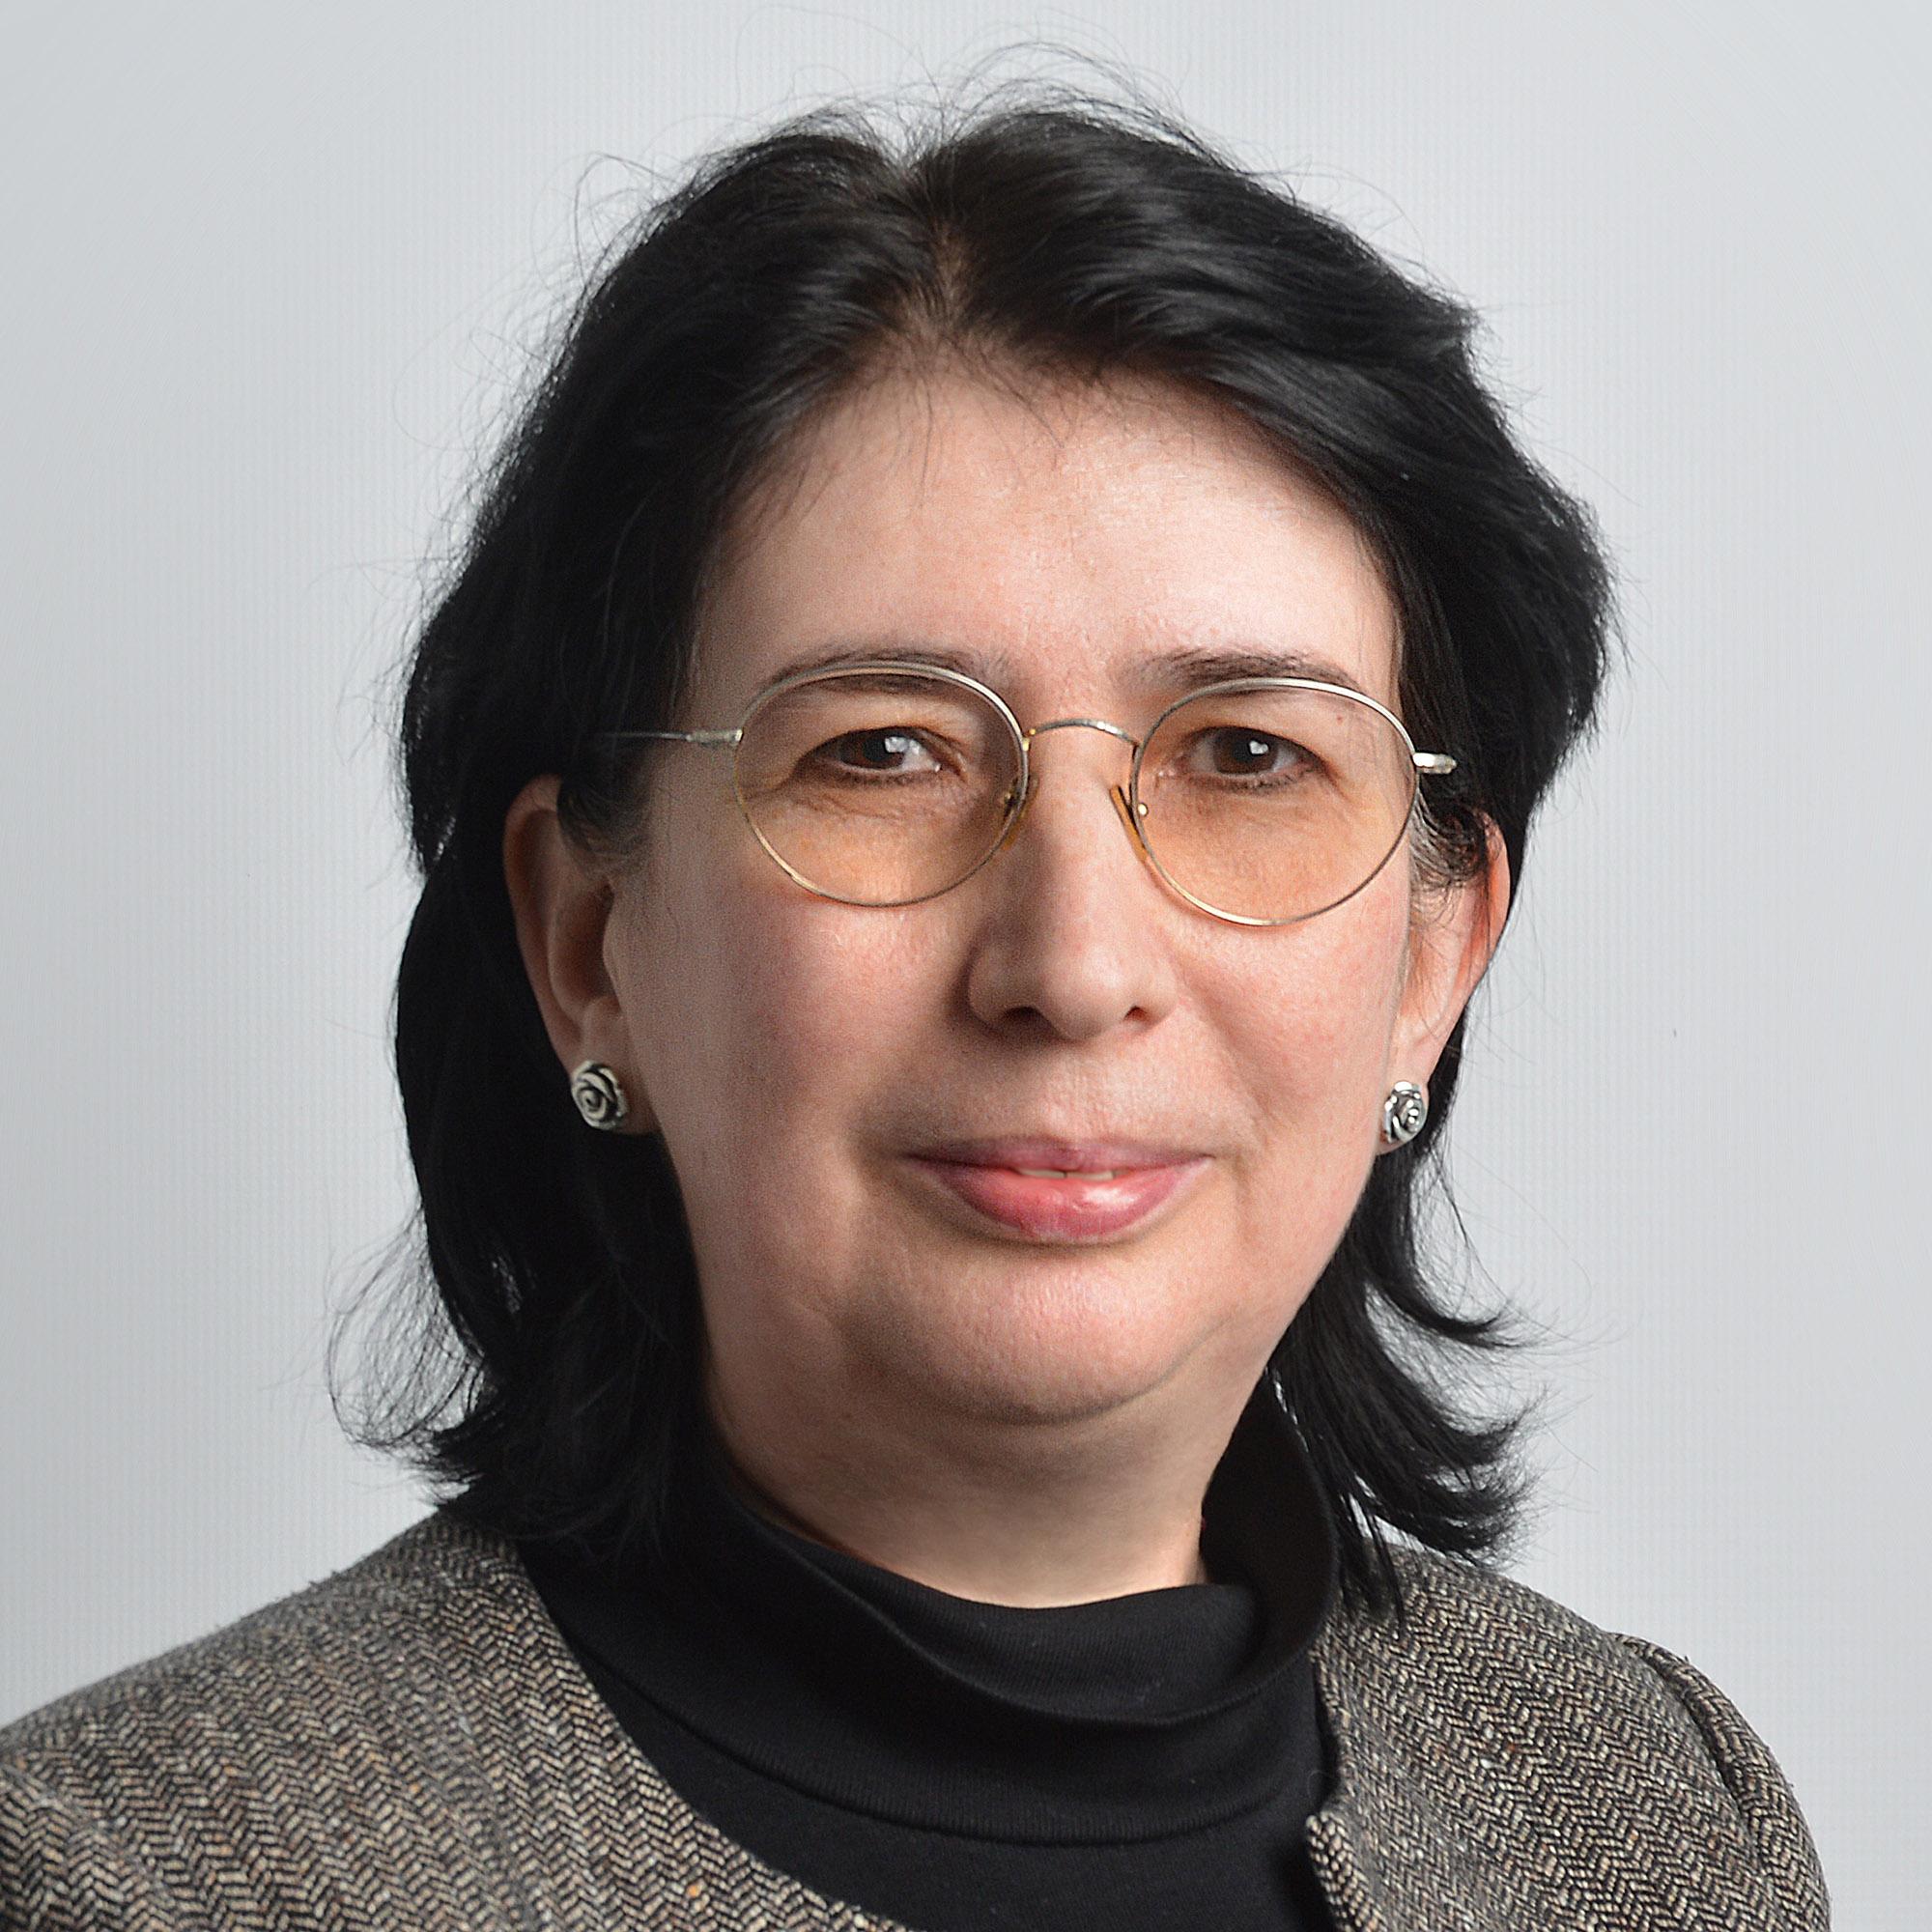 Emilia TOMESCU